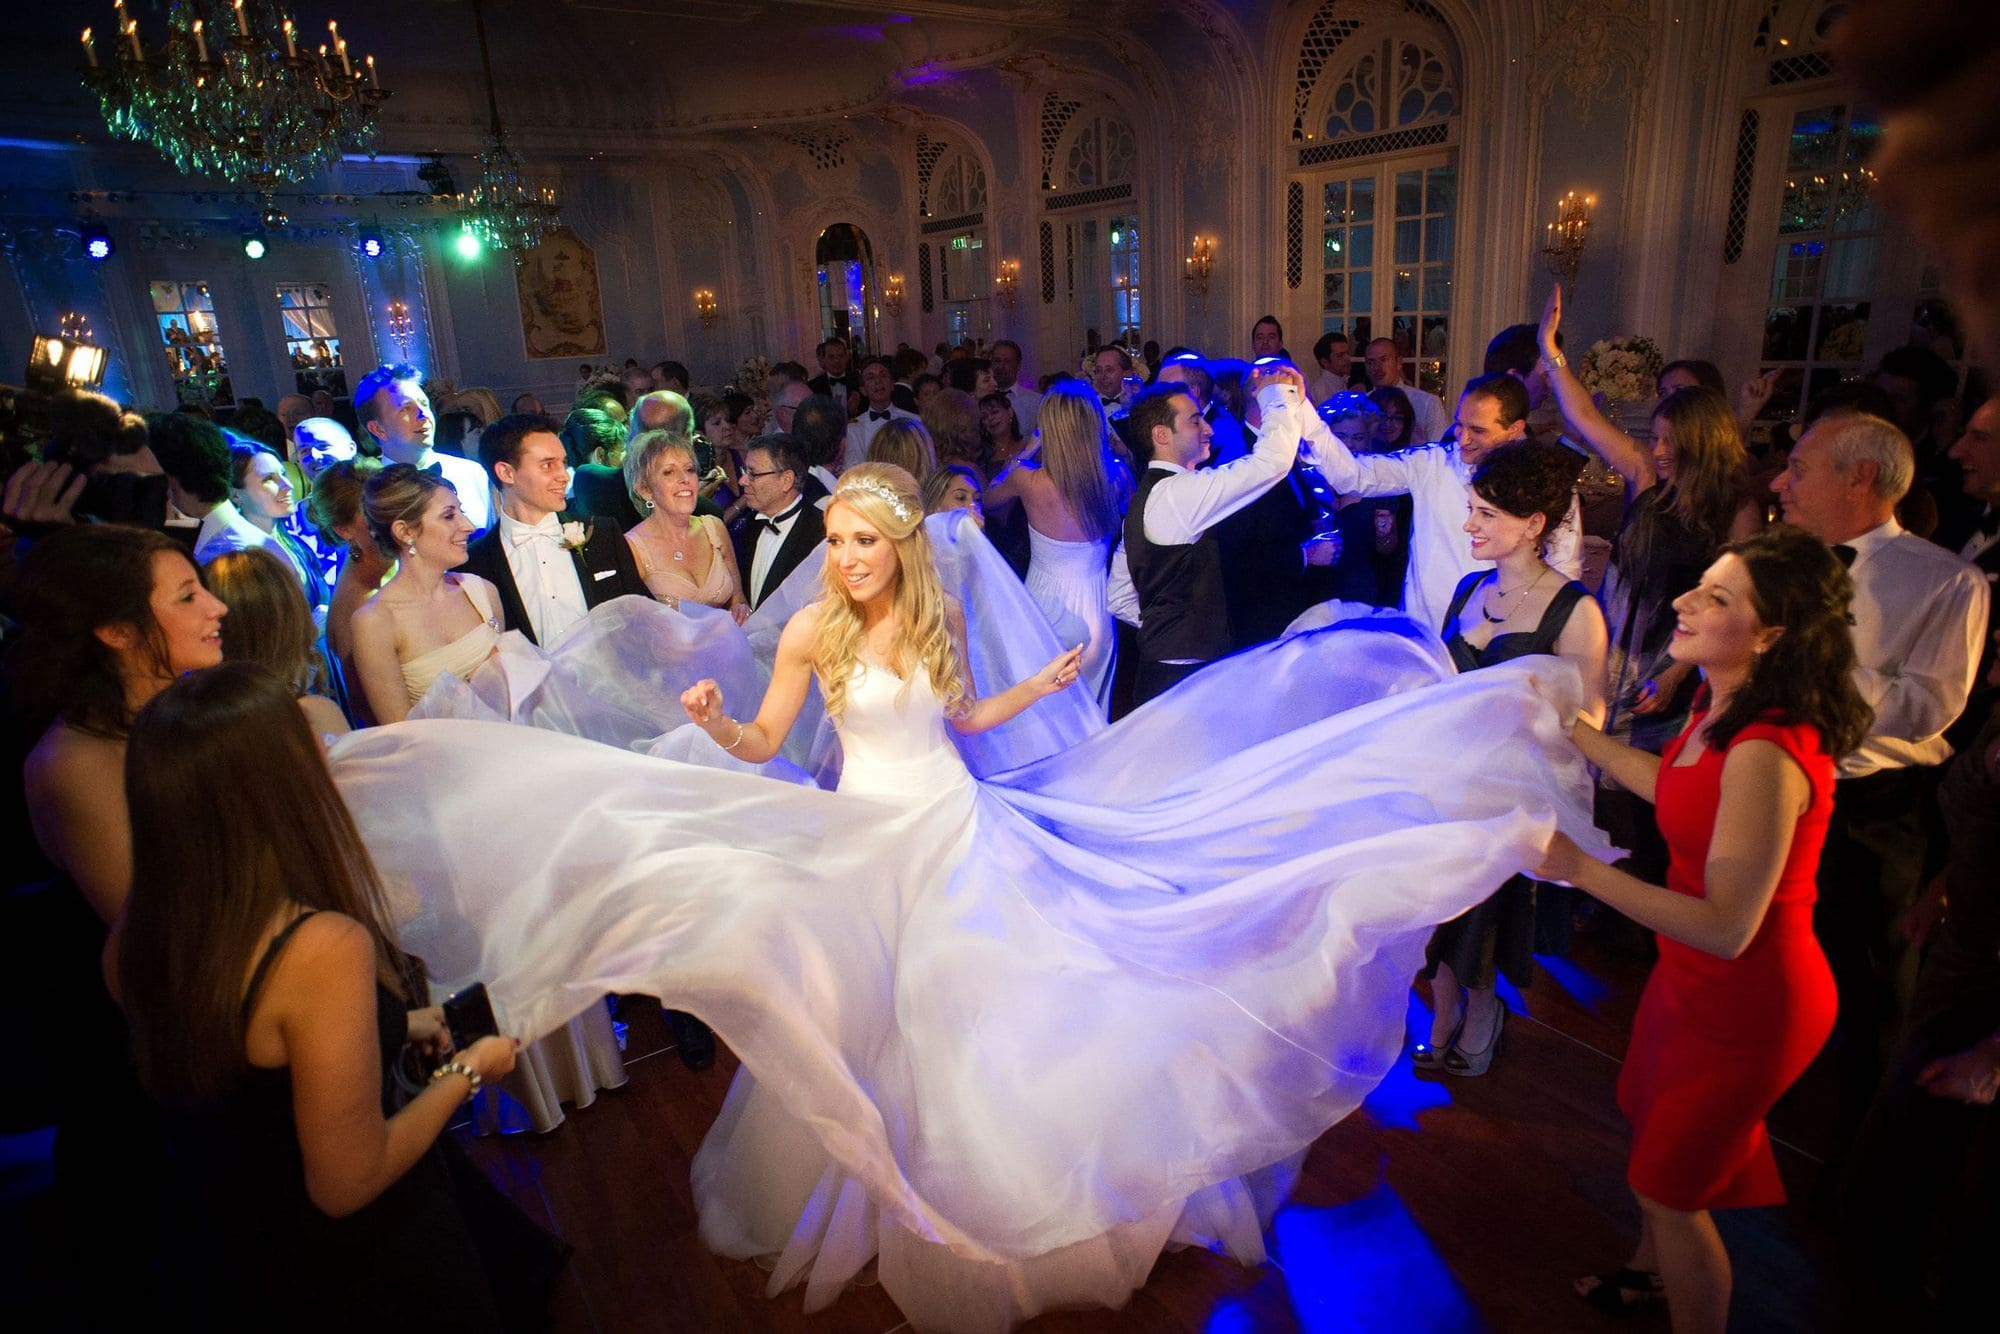 Mark-Seymour-Wedding-Photographer-UK-26 10